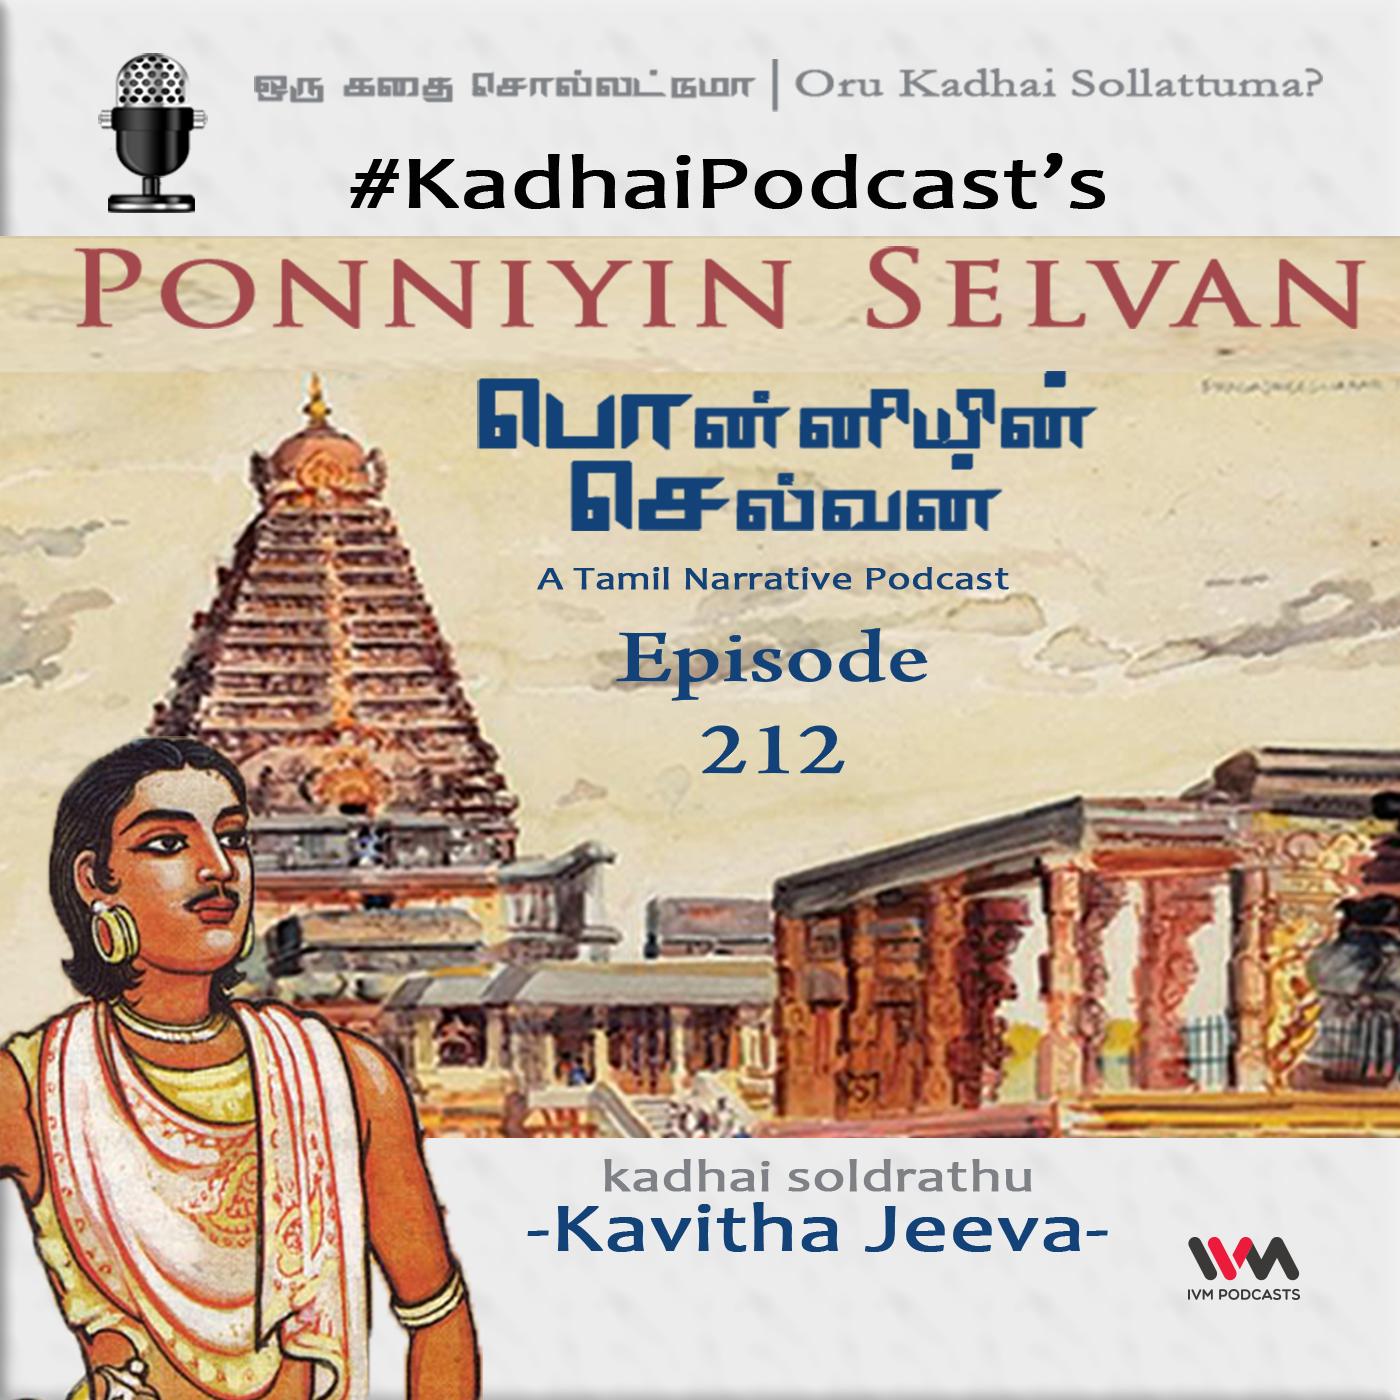 KadhaiPodcast's Ponniyin Selvan - Episode # 212